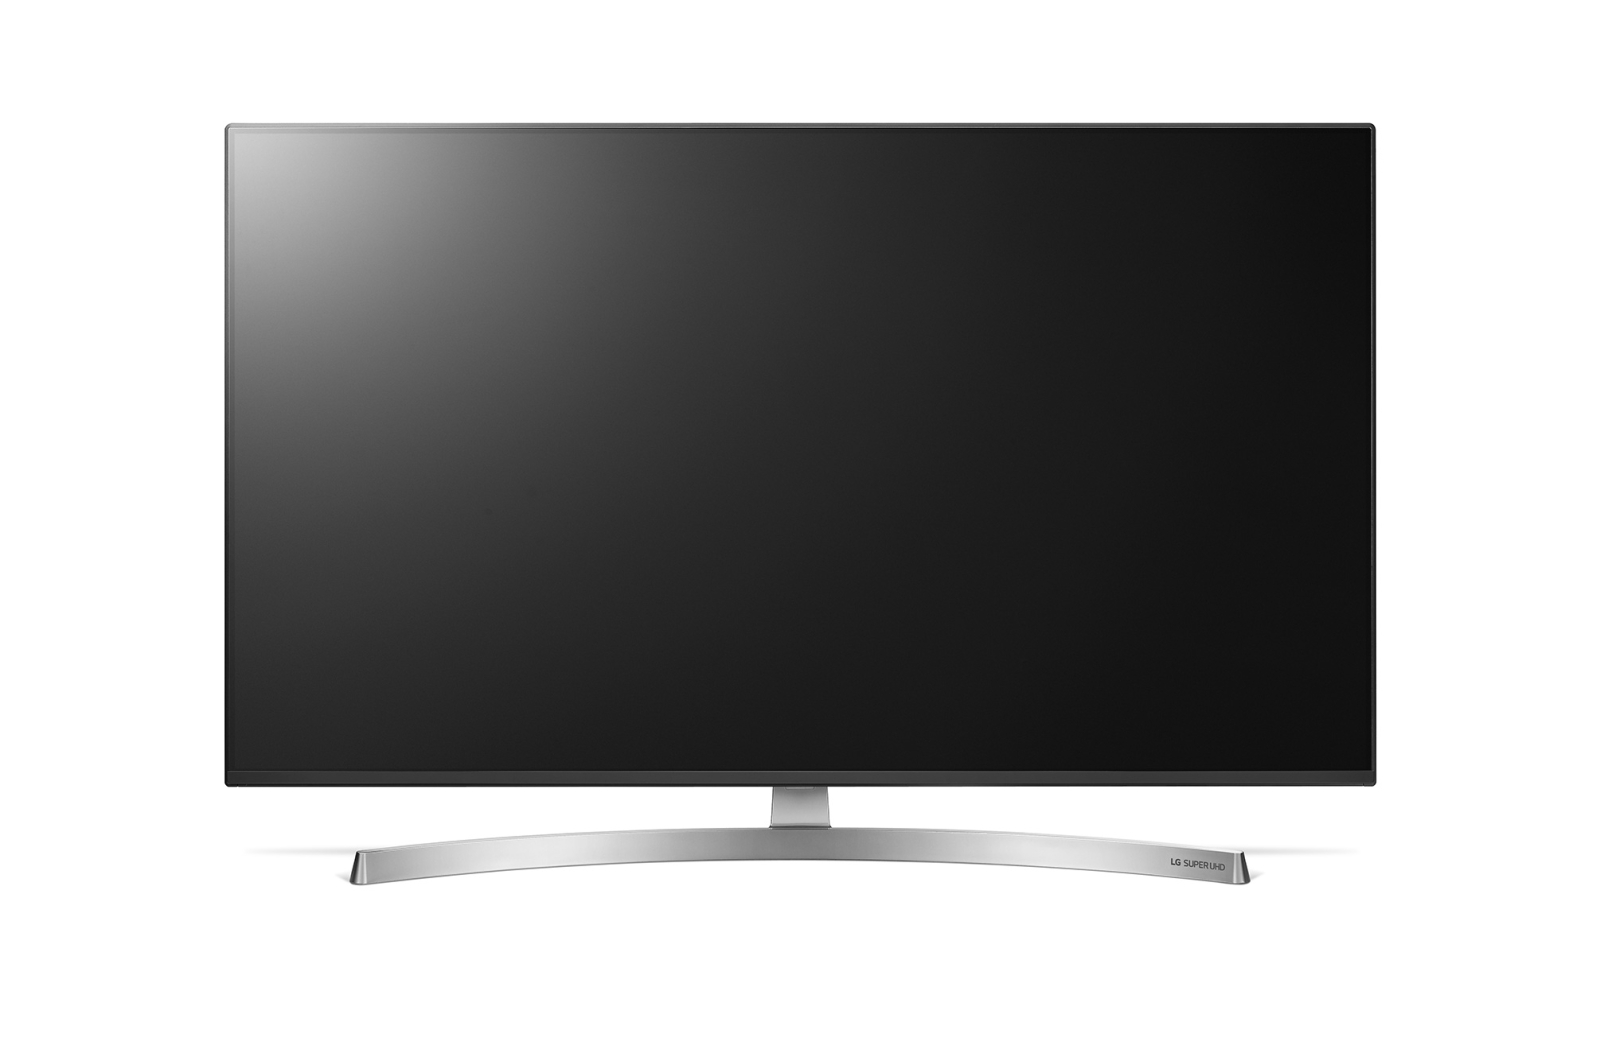 LG 65SK8500 telewizor 4K z AI